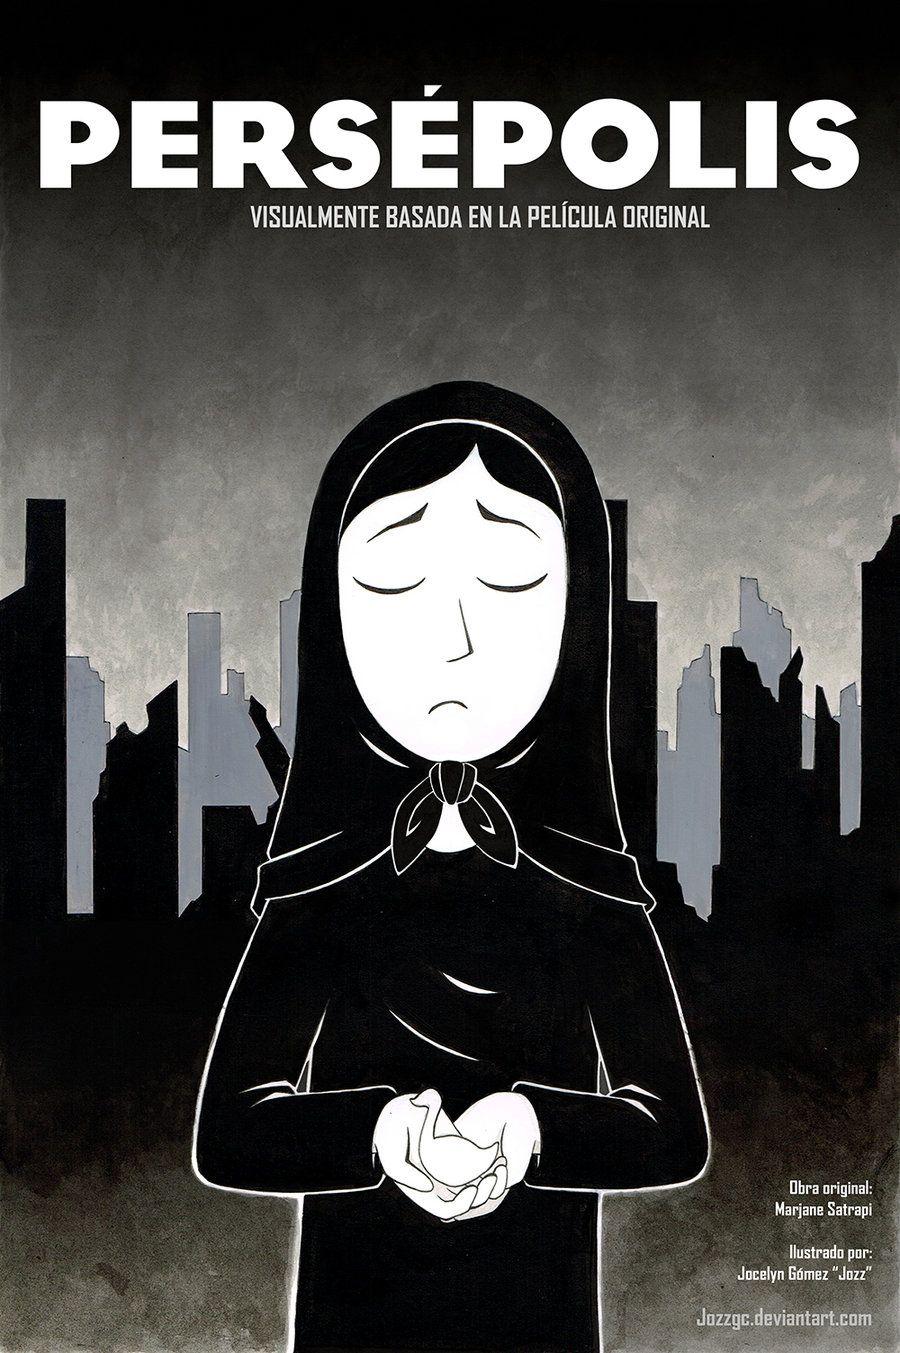 Persepolis Animated Movies Animation Film Animation